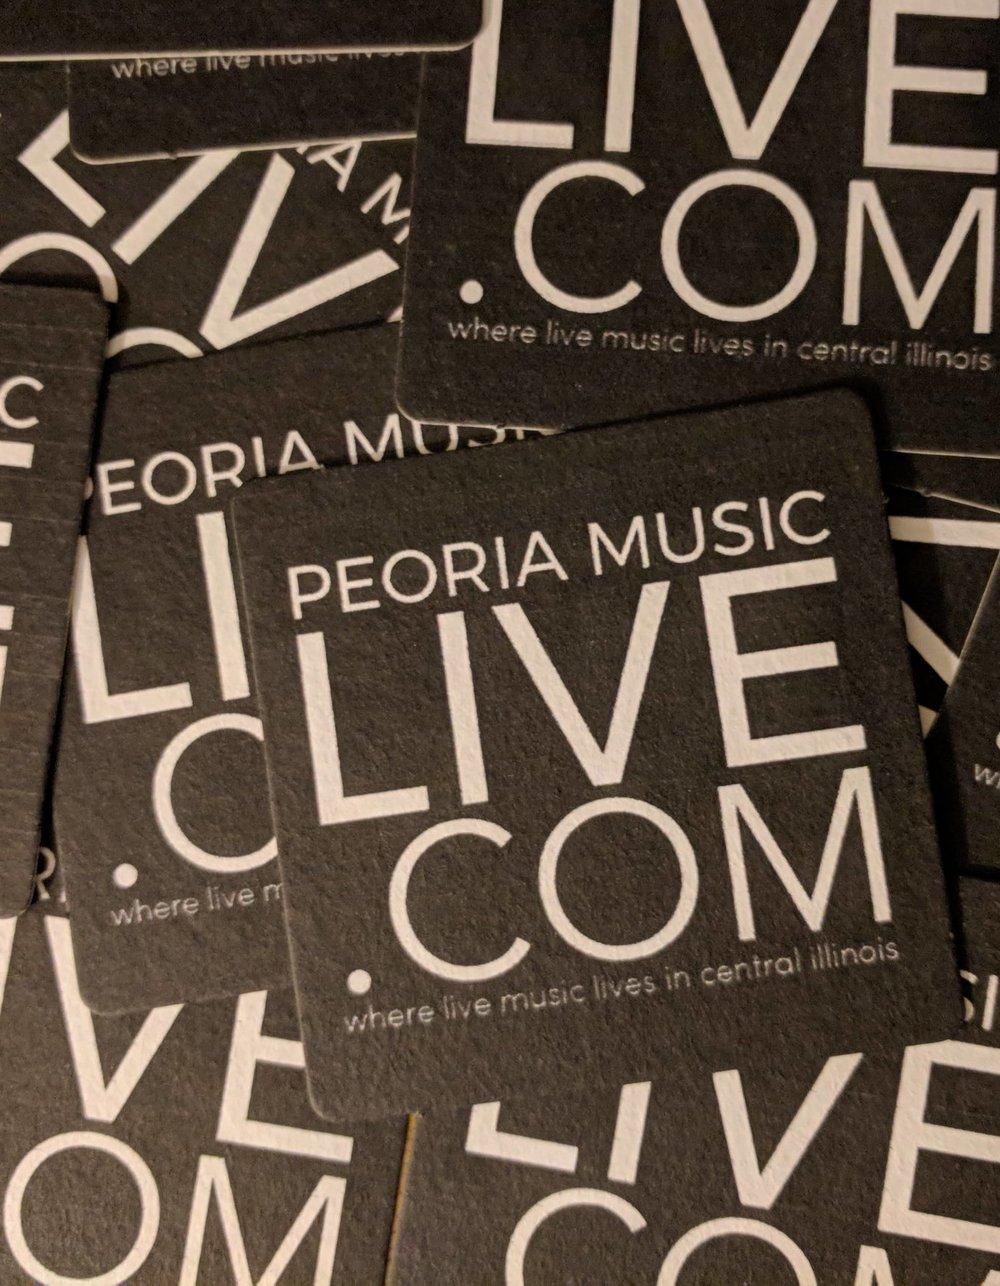 Peoria Music Live Coasters.jpg